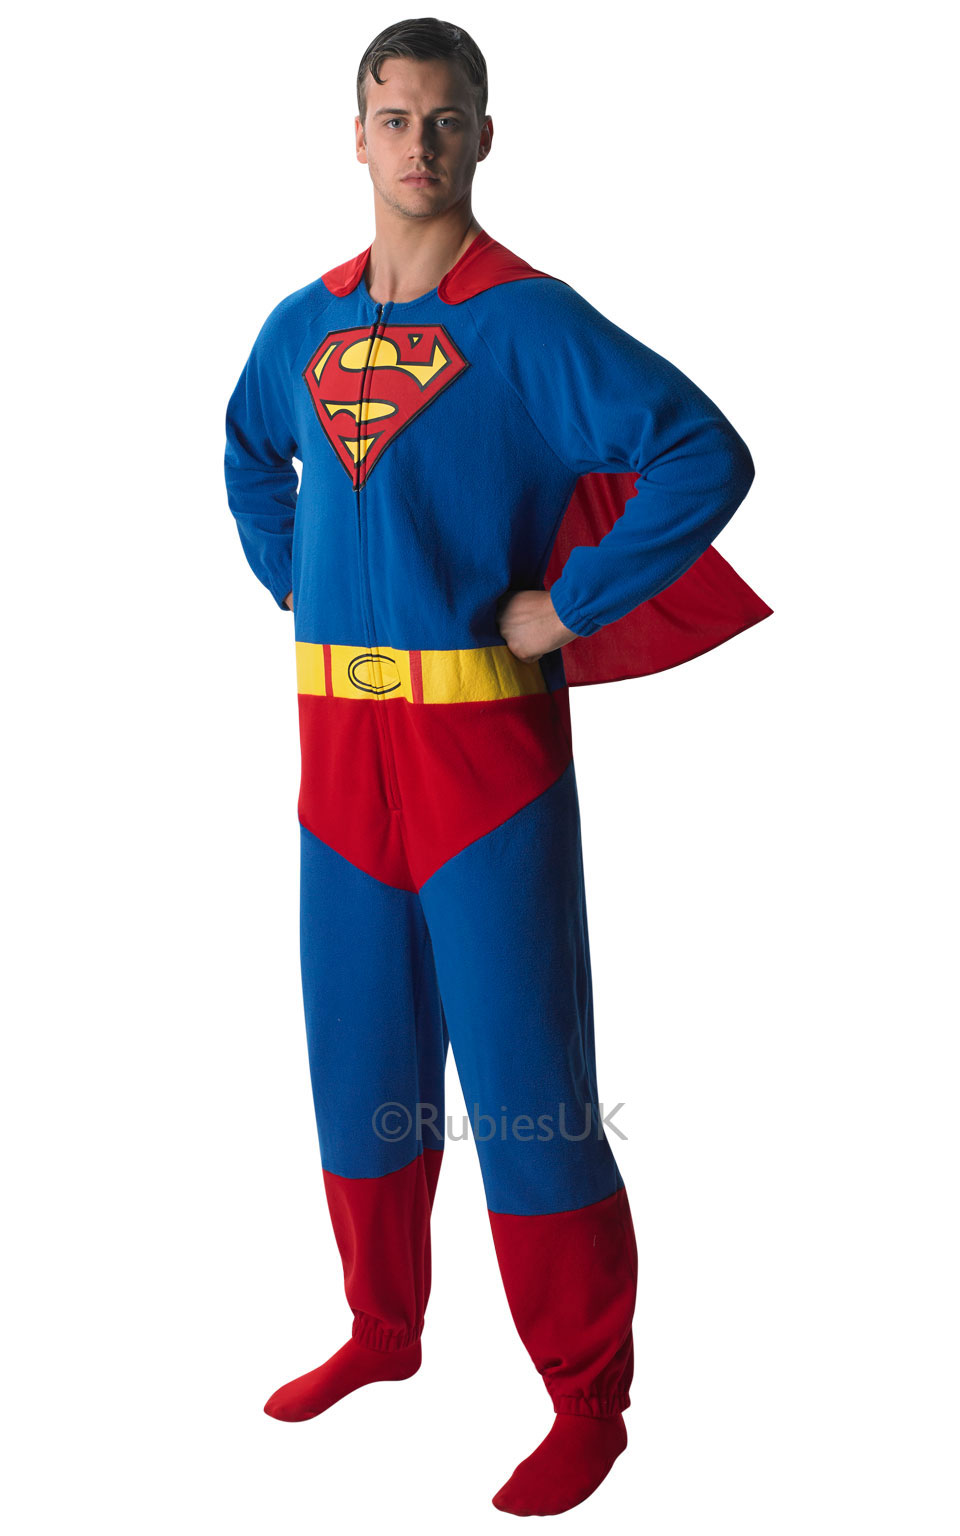 Mens Adult Superman Onesie Fancy Dress Costume Comic Superhero Outfit Official